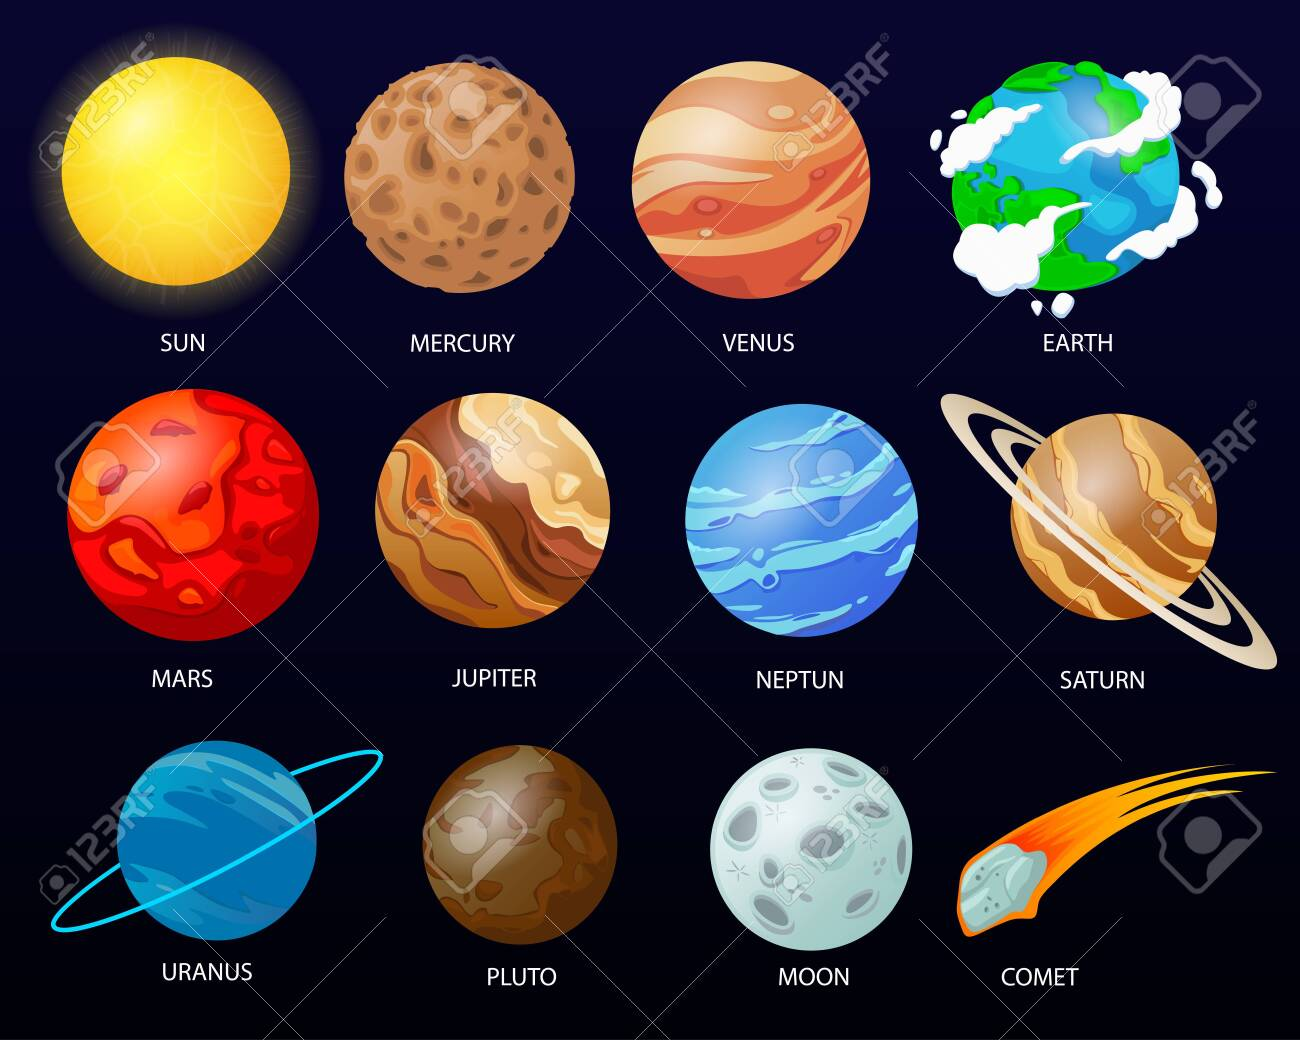 Cartoon solar system planets - 151613932